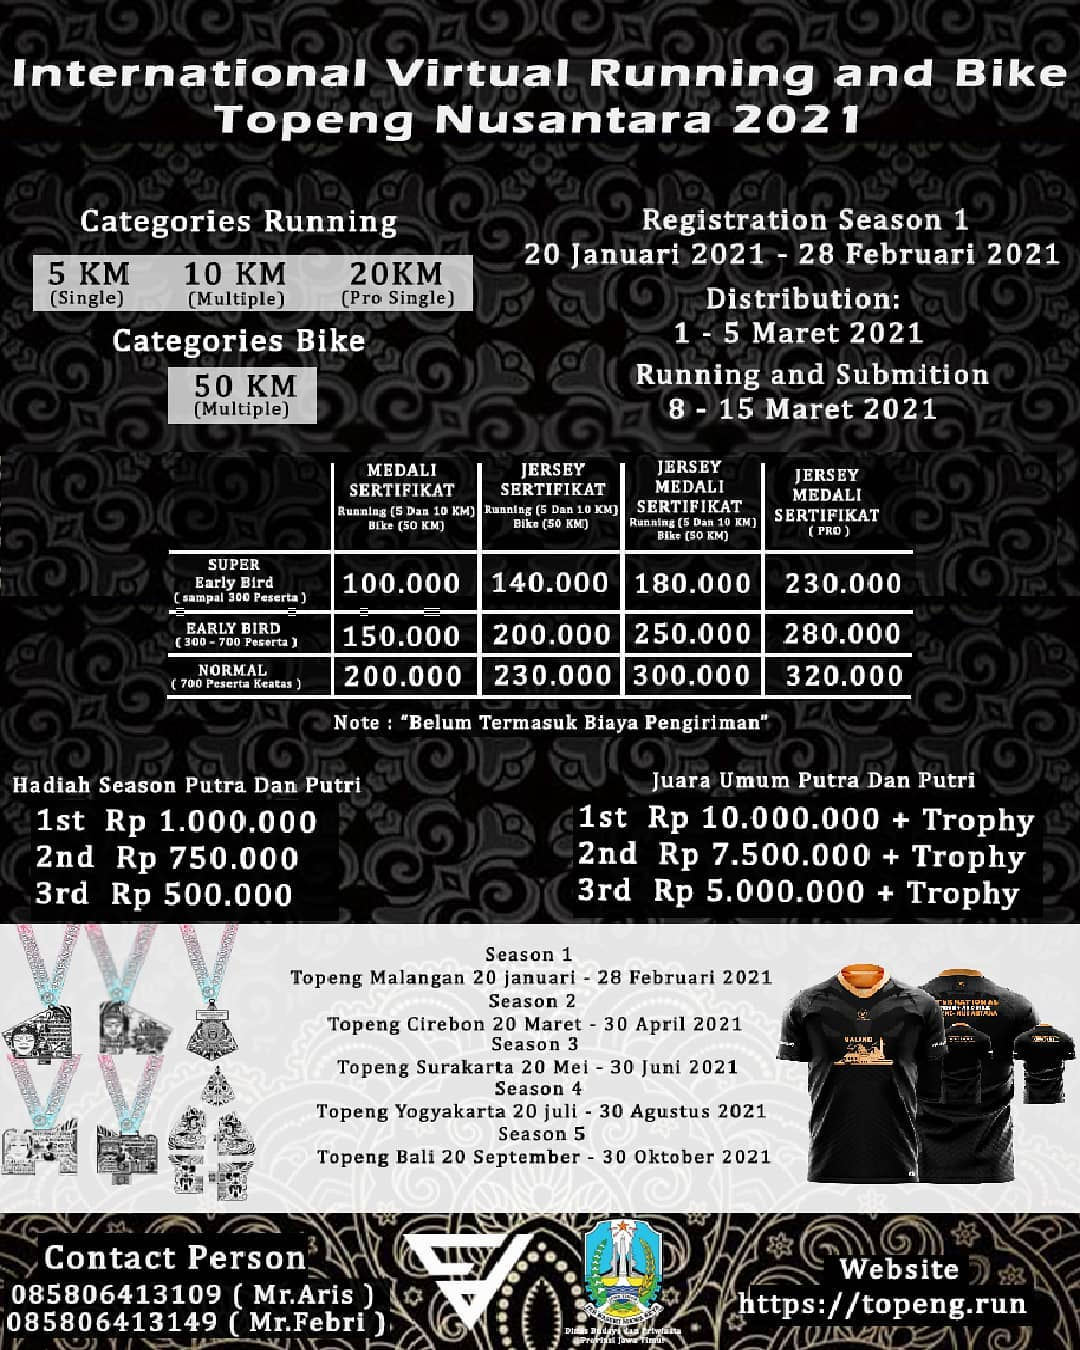 International Running, Bike and Photography - Topeng Nusantara • 2021